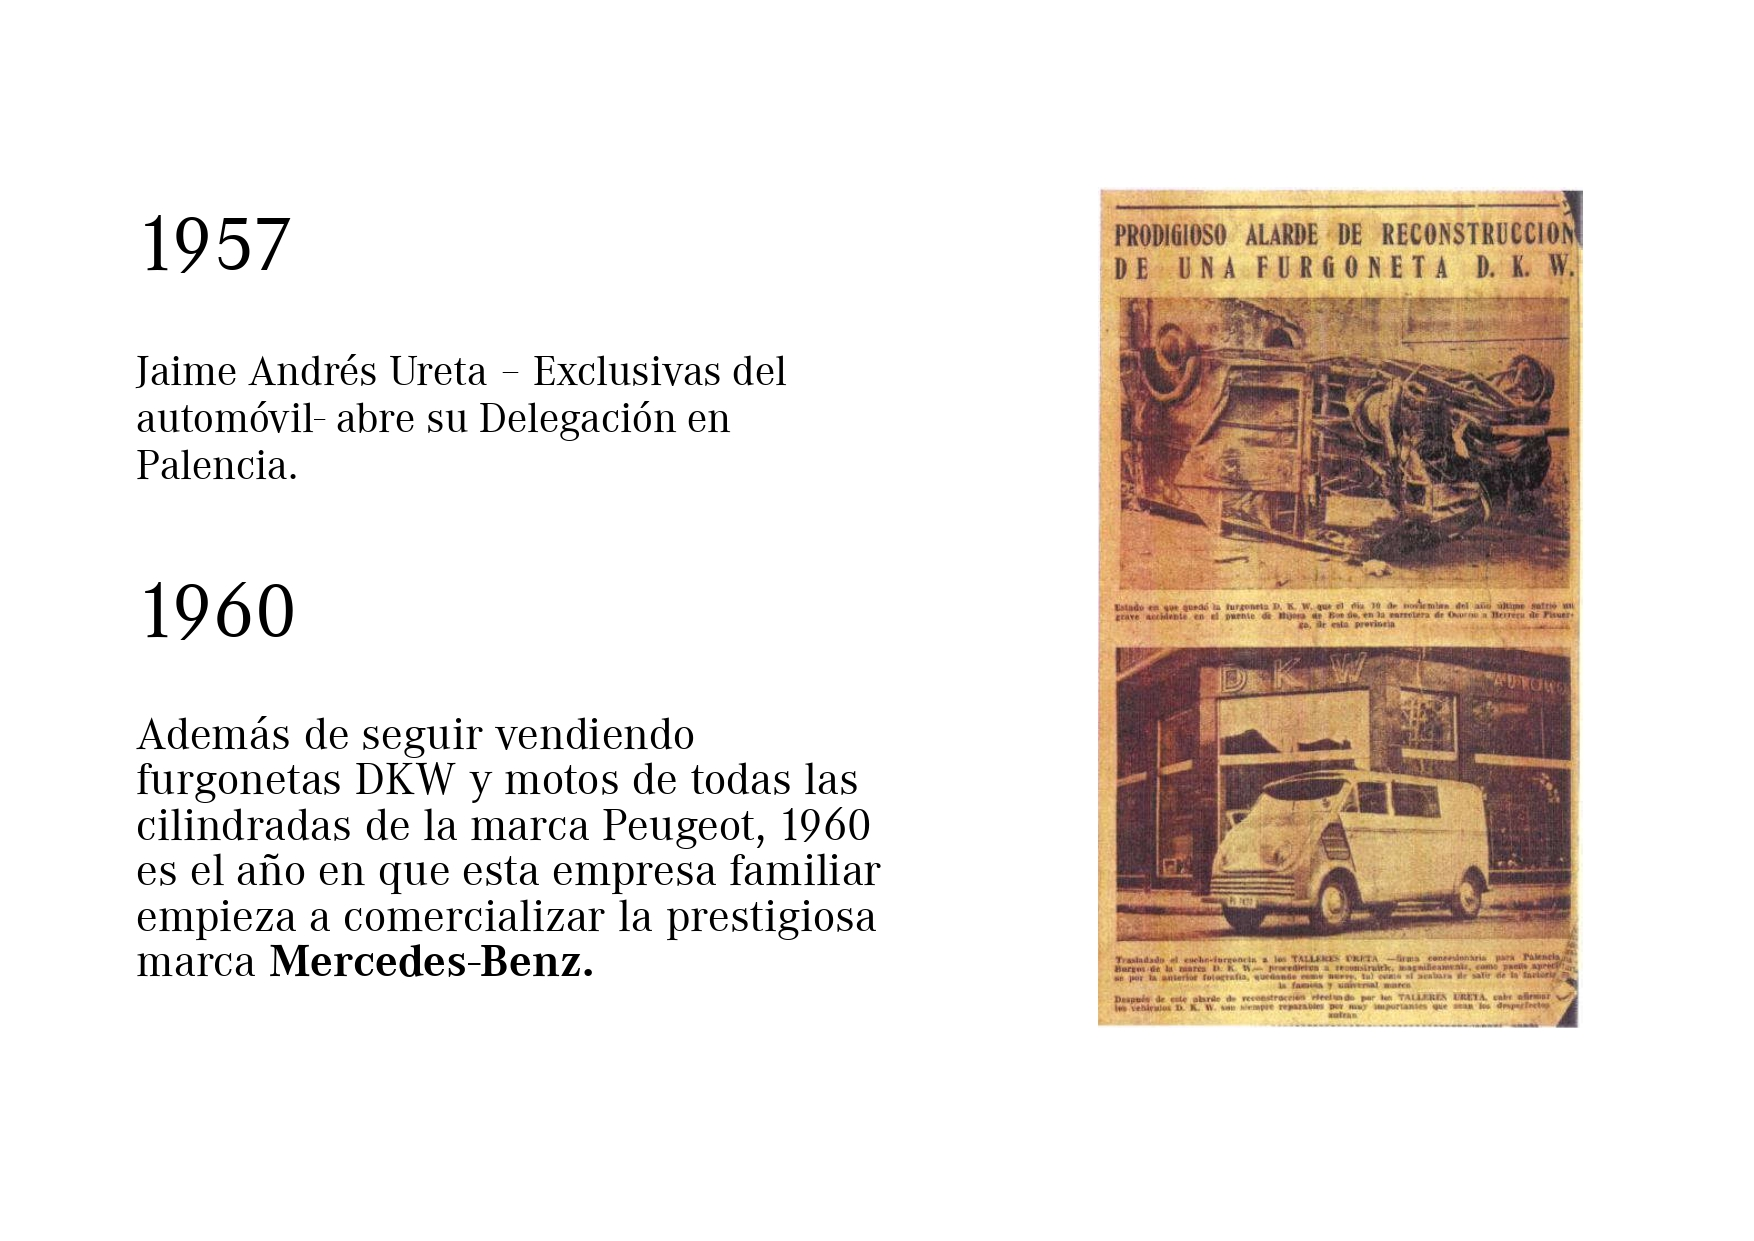 historia-uretamotor_page-0005